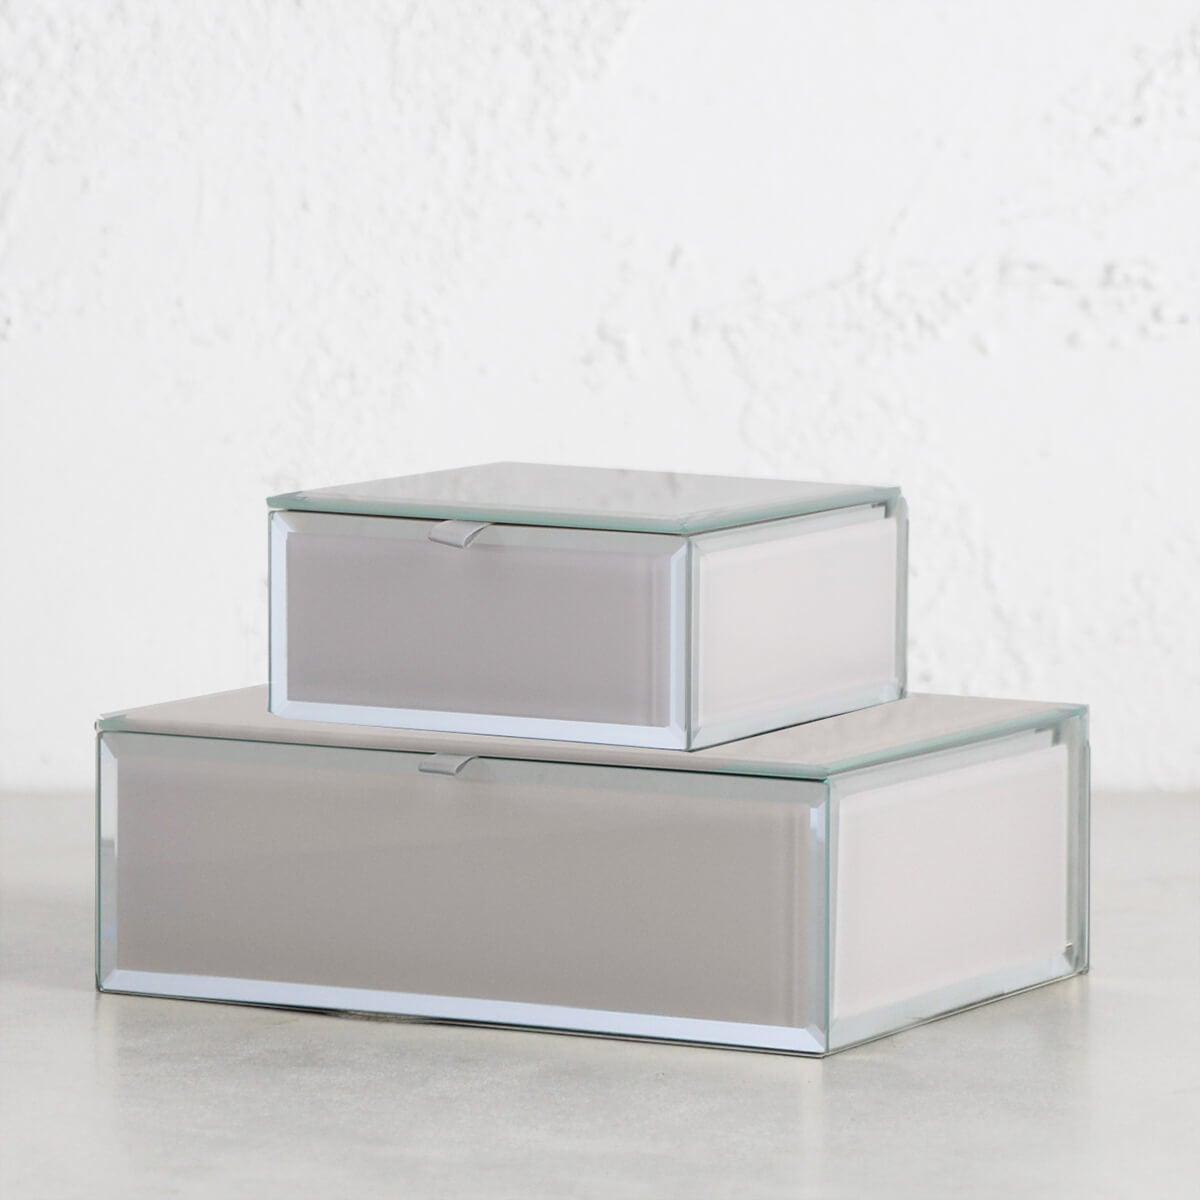 ONE SIX EIGHT LONDON - SARA GLASS JEWELLERY BOX - NUDE BUNDLE